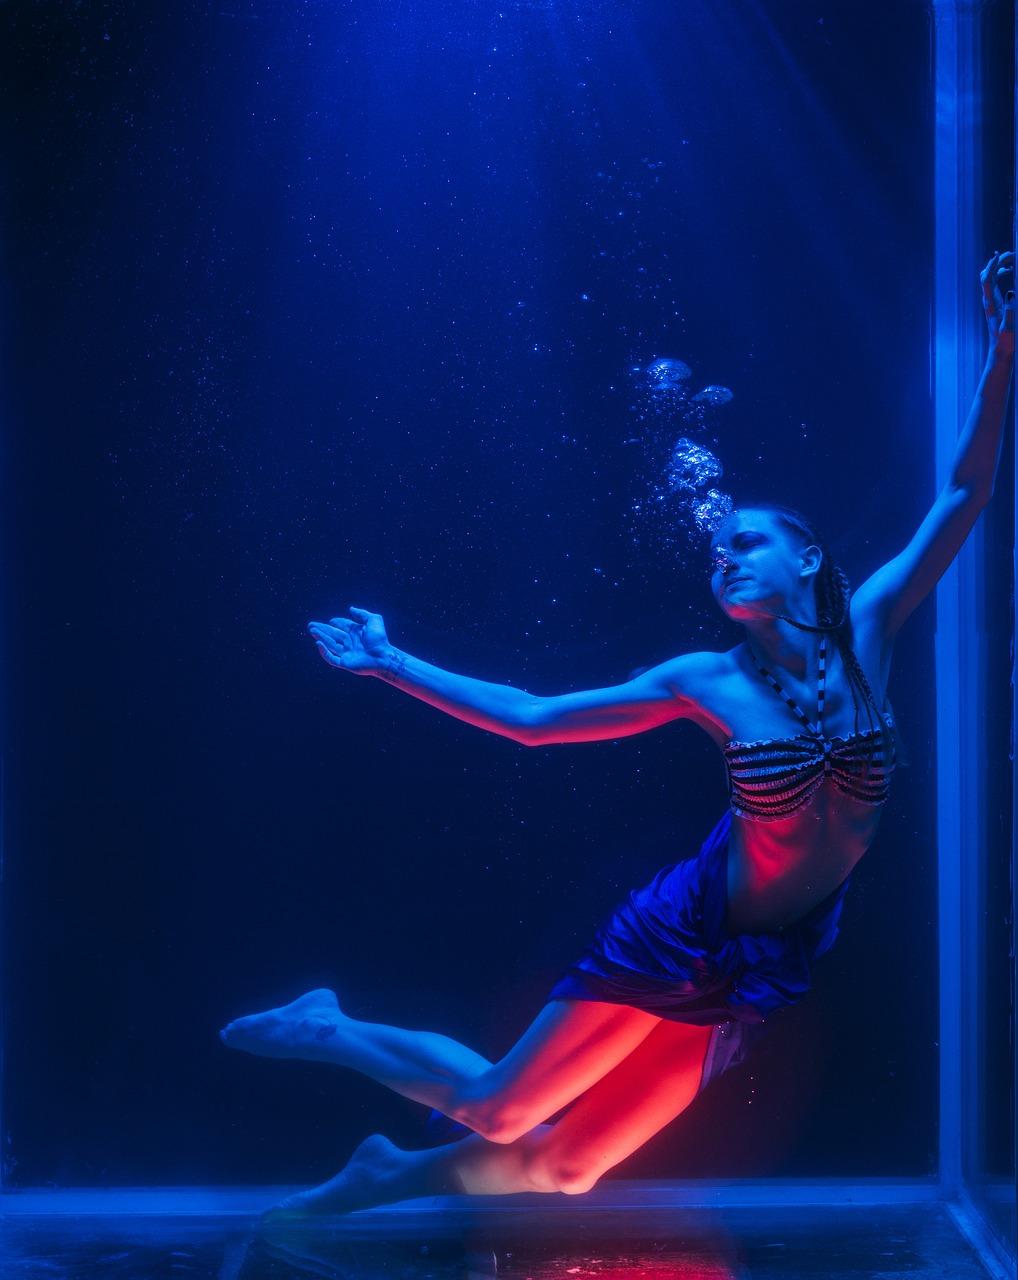 water, underwater, freedom